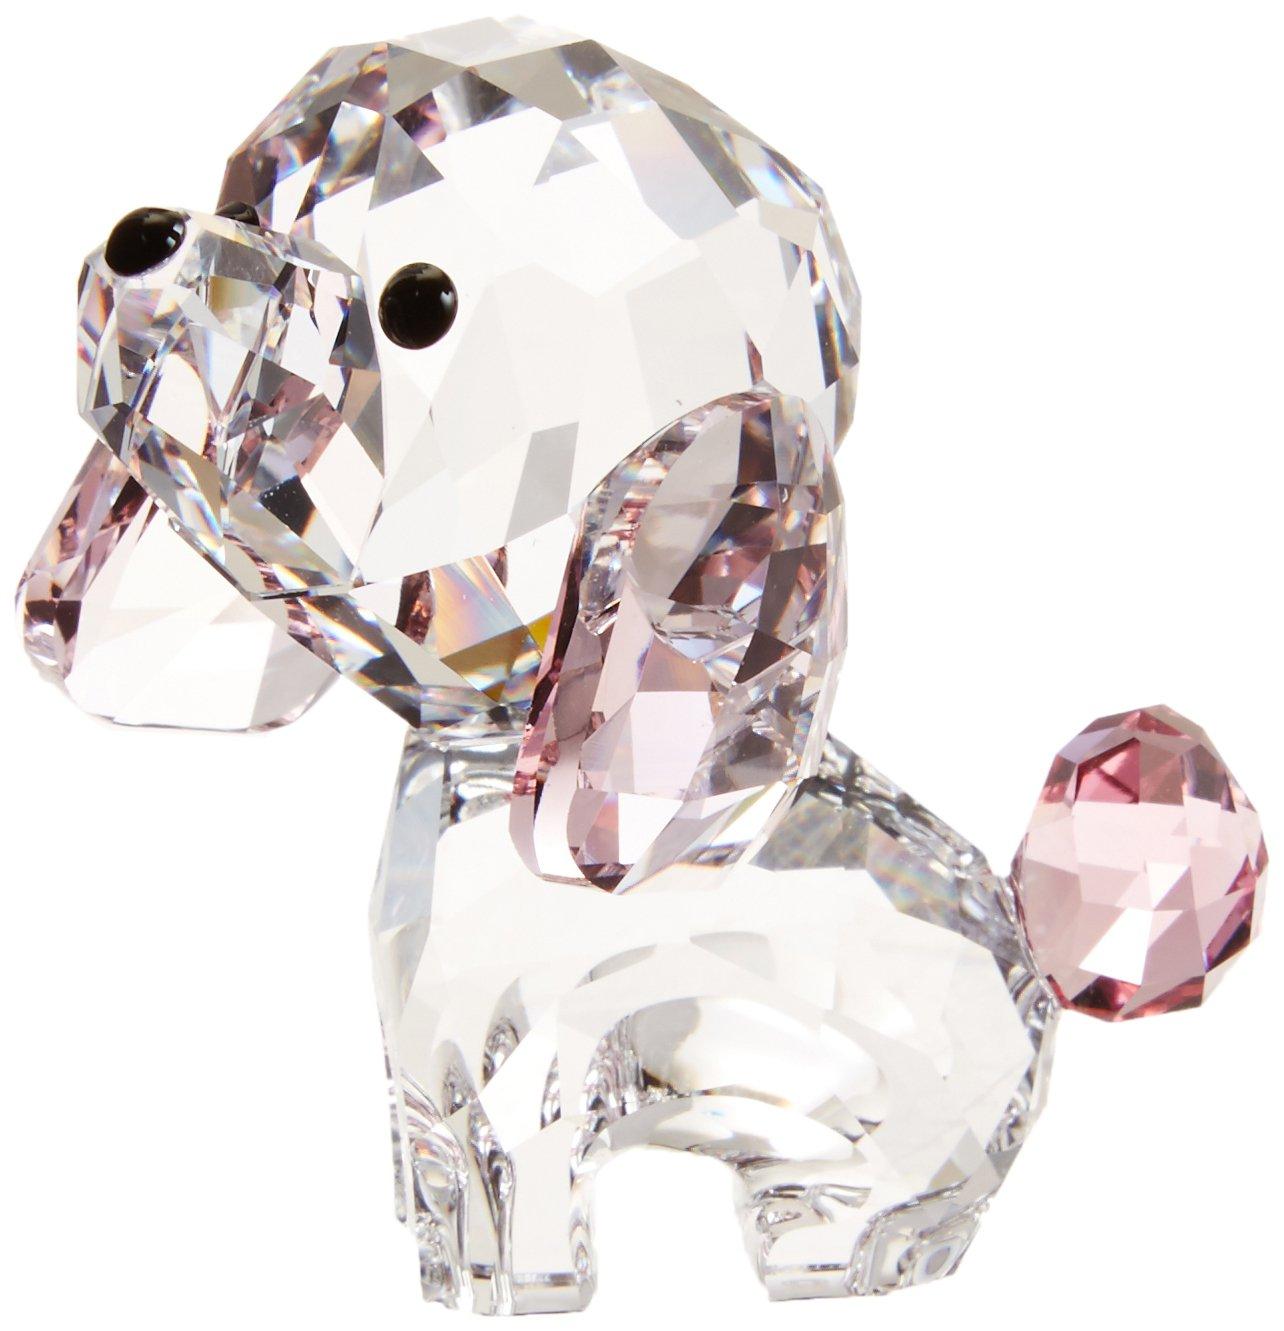 Swarovski Puppy Figurine, Rosie The Poodle